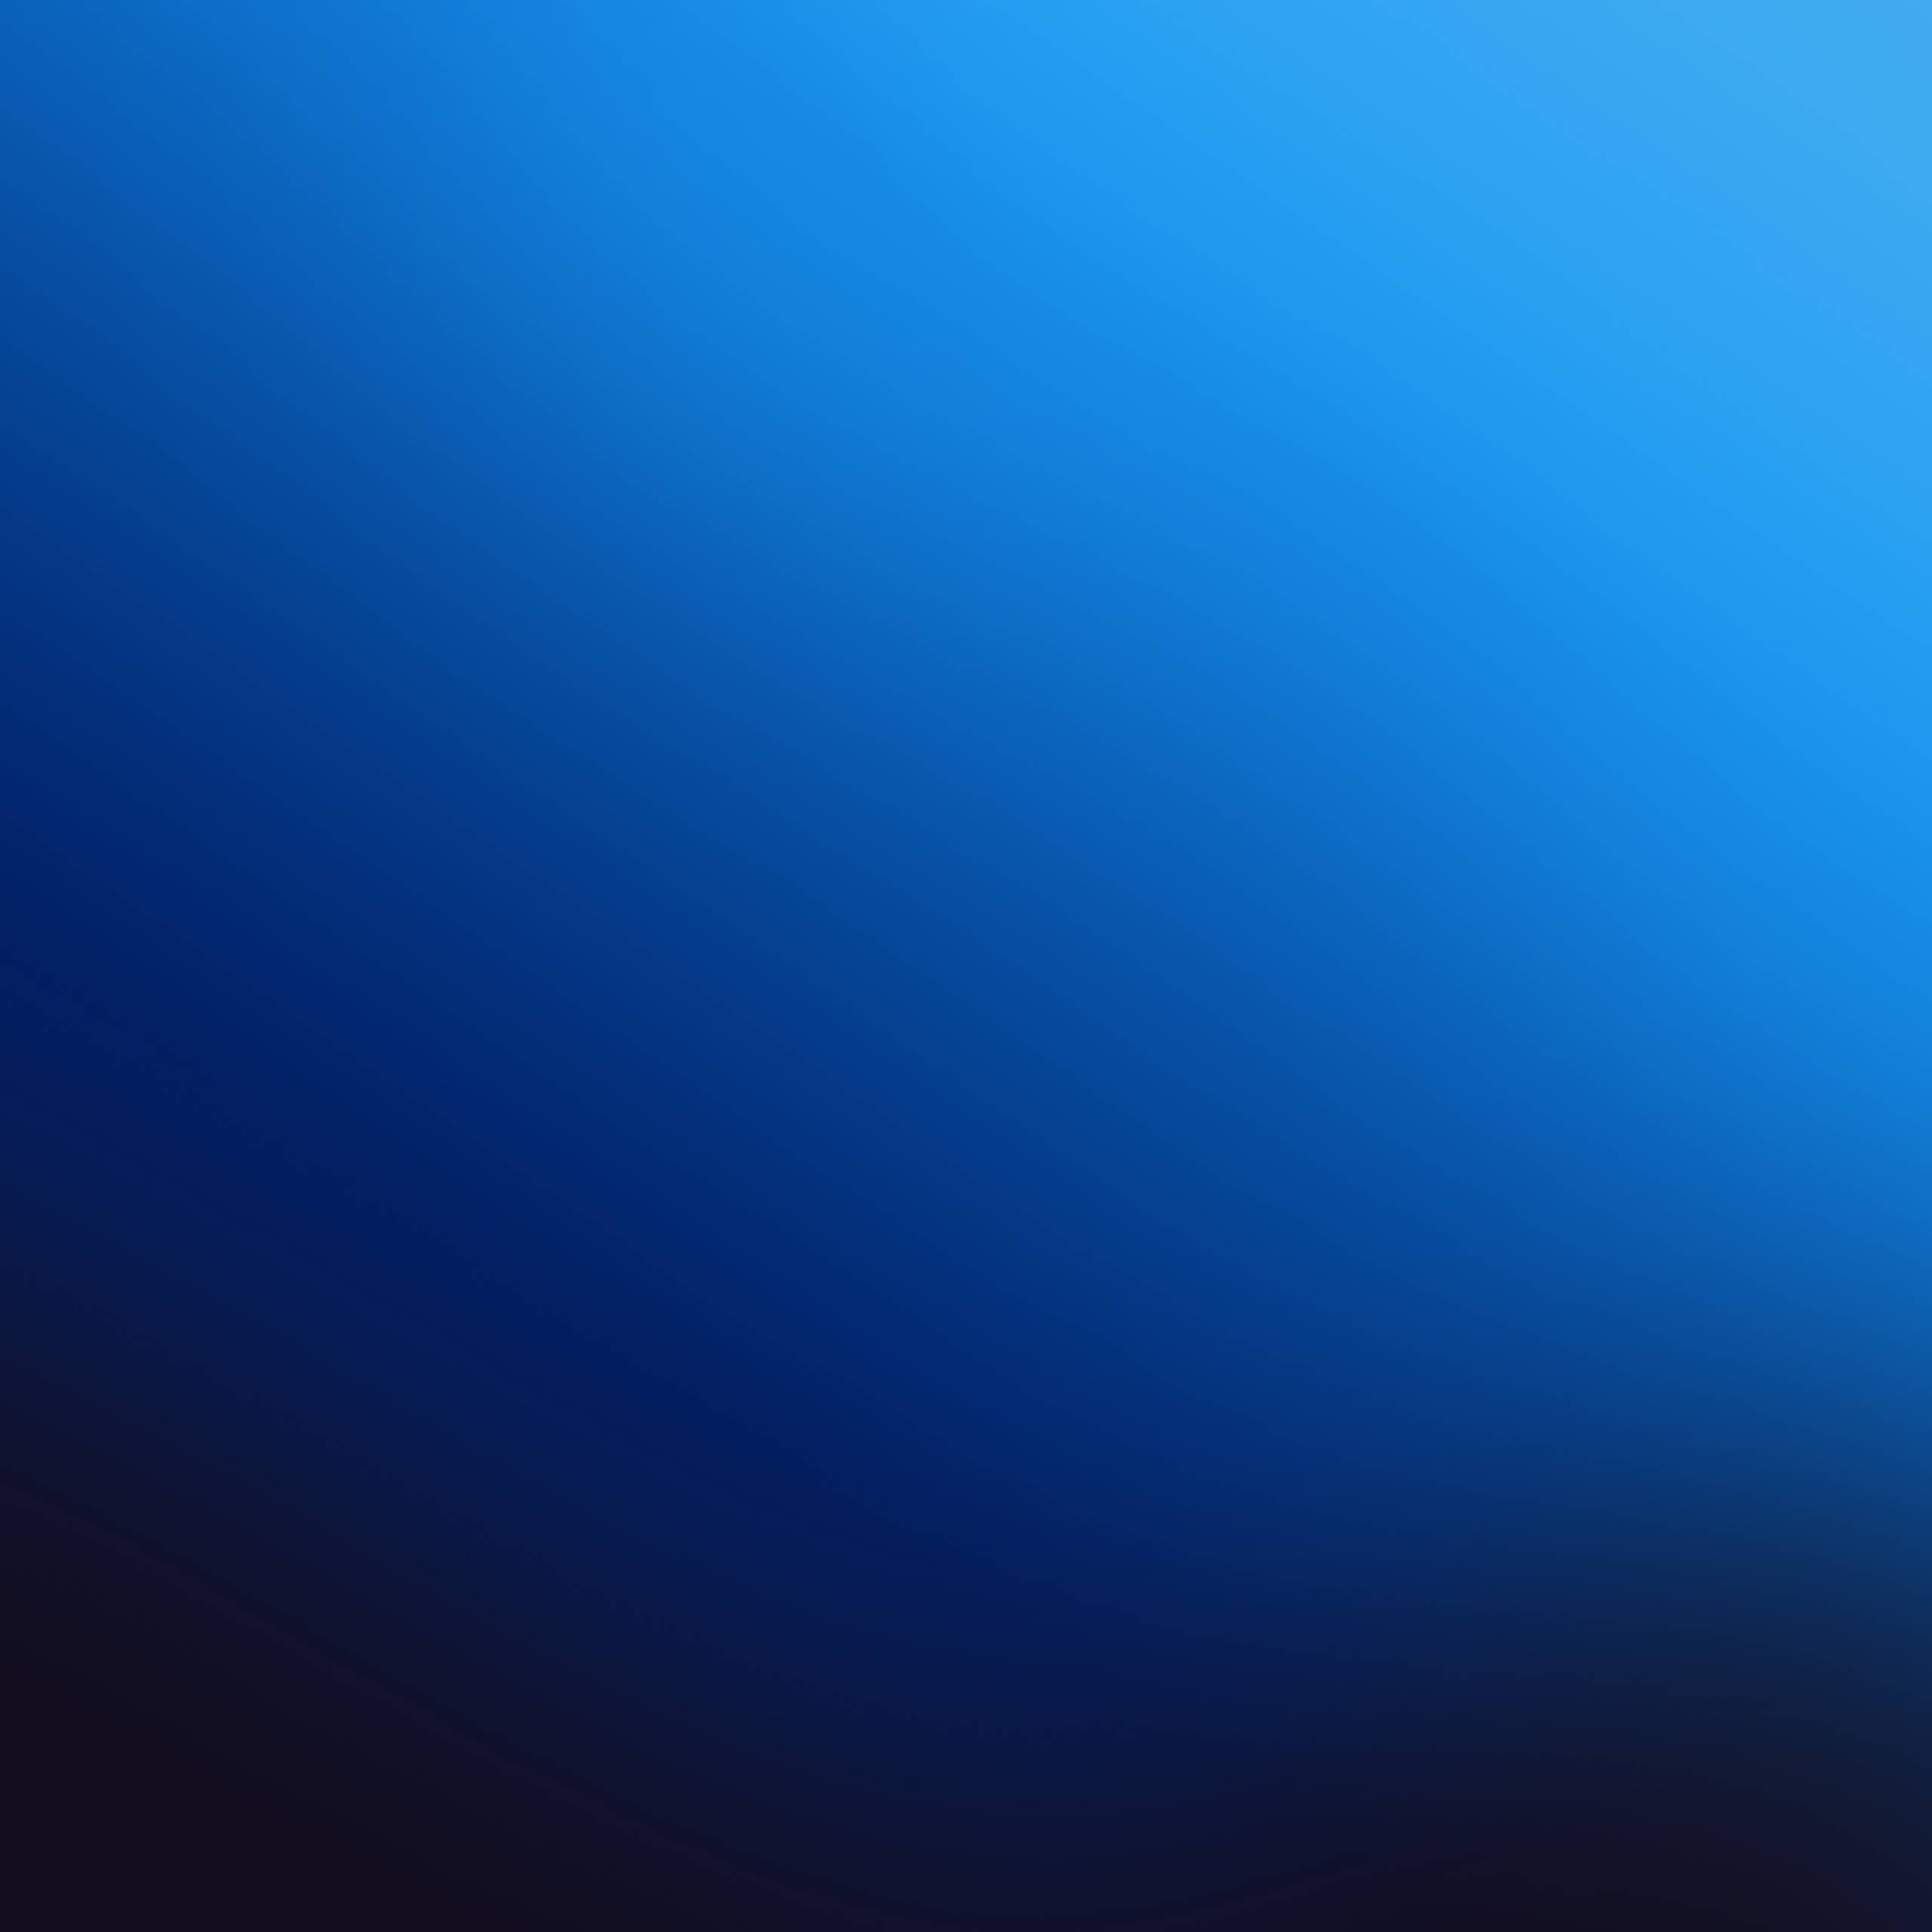 Samsung Galaxy J7 Max Stock Wallpaper Hd 2560x2560 Download Hd Wallpaper Wallpapertip